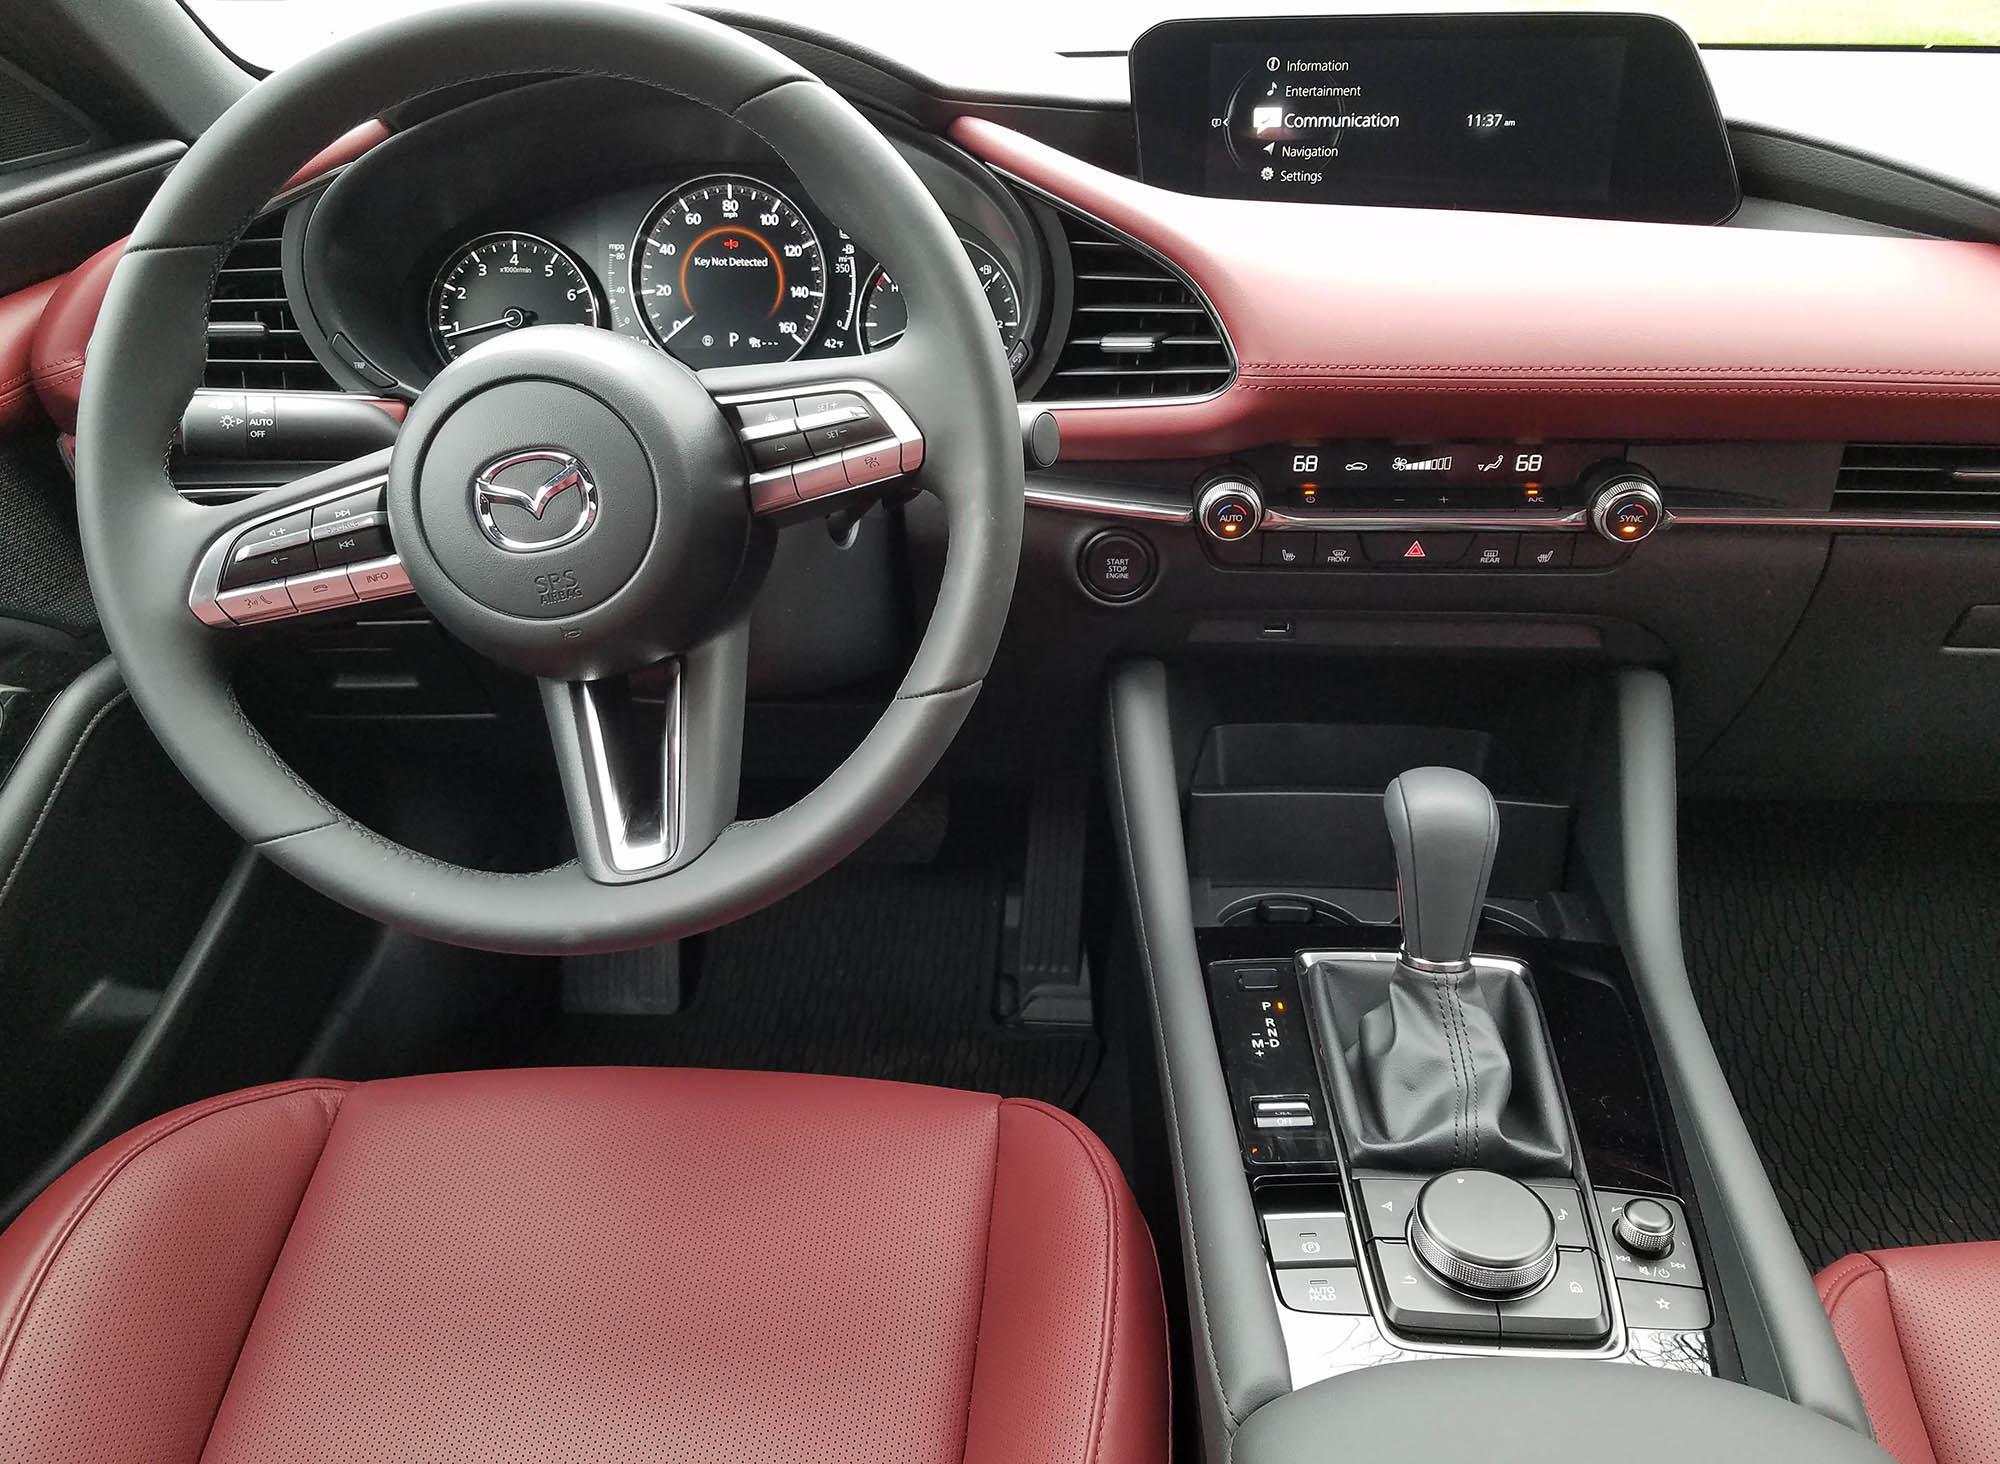 2019 Mazda3 Platinum AWD Hatchback Review: Sleek, Fast & Fun